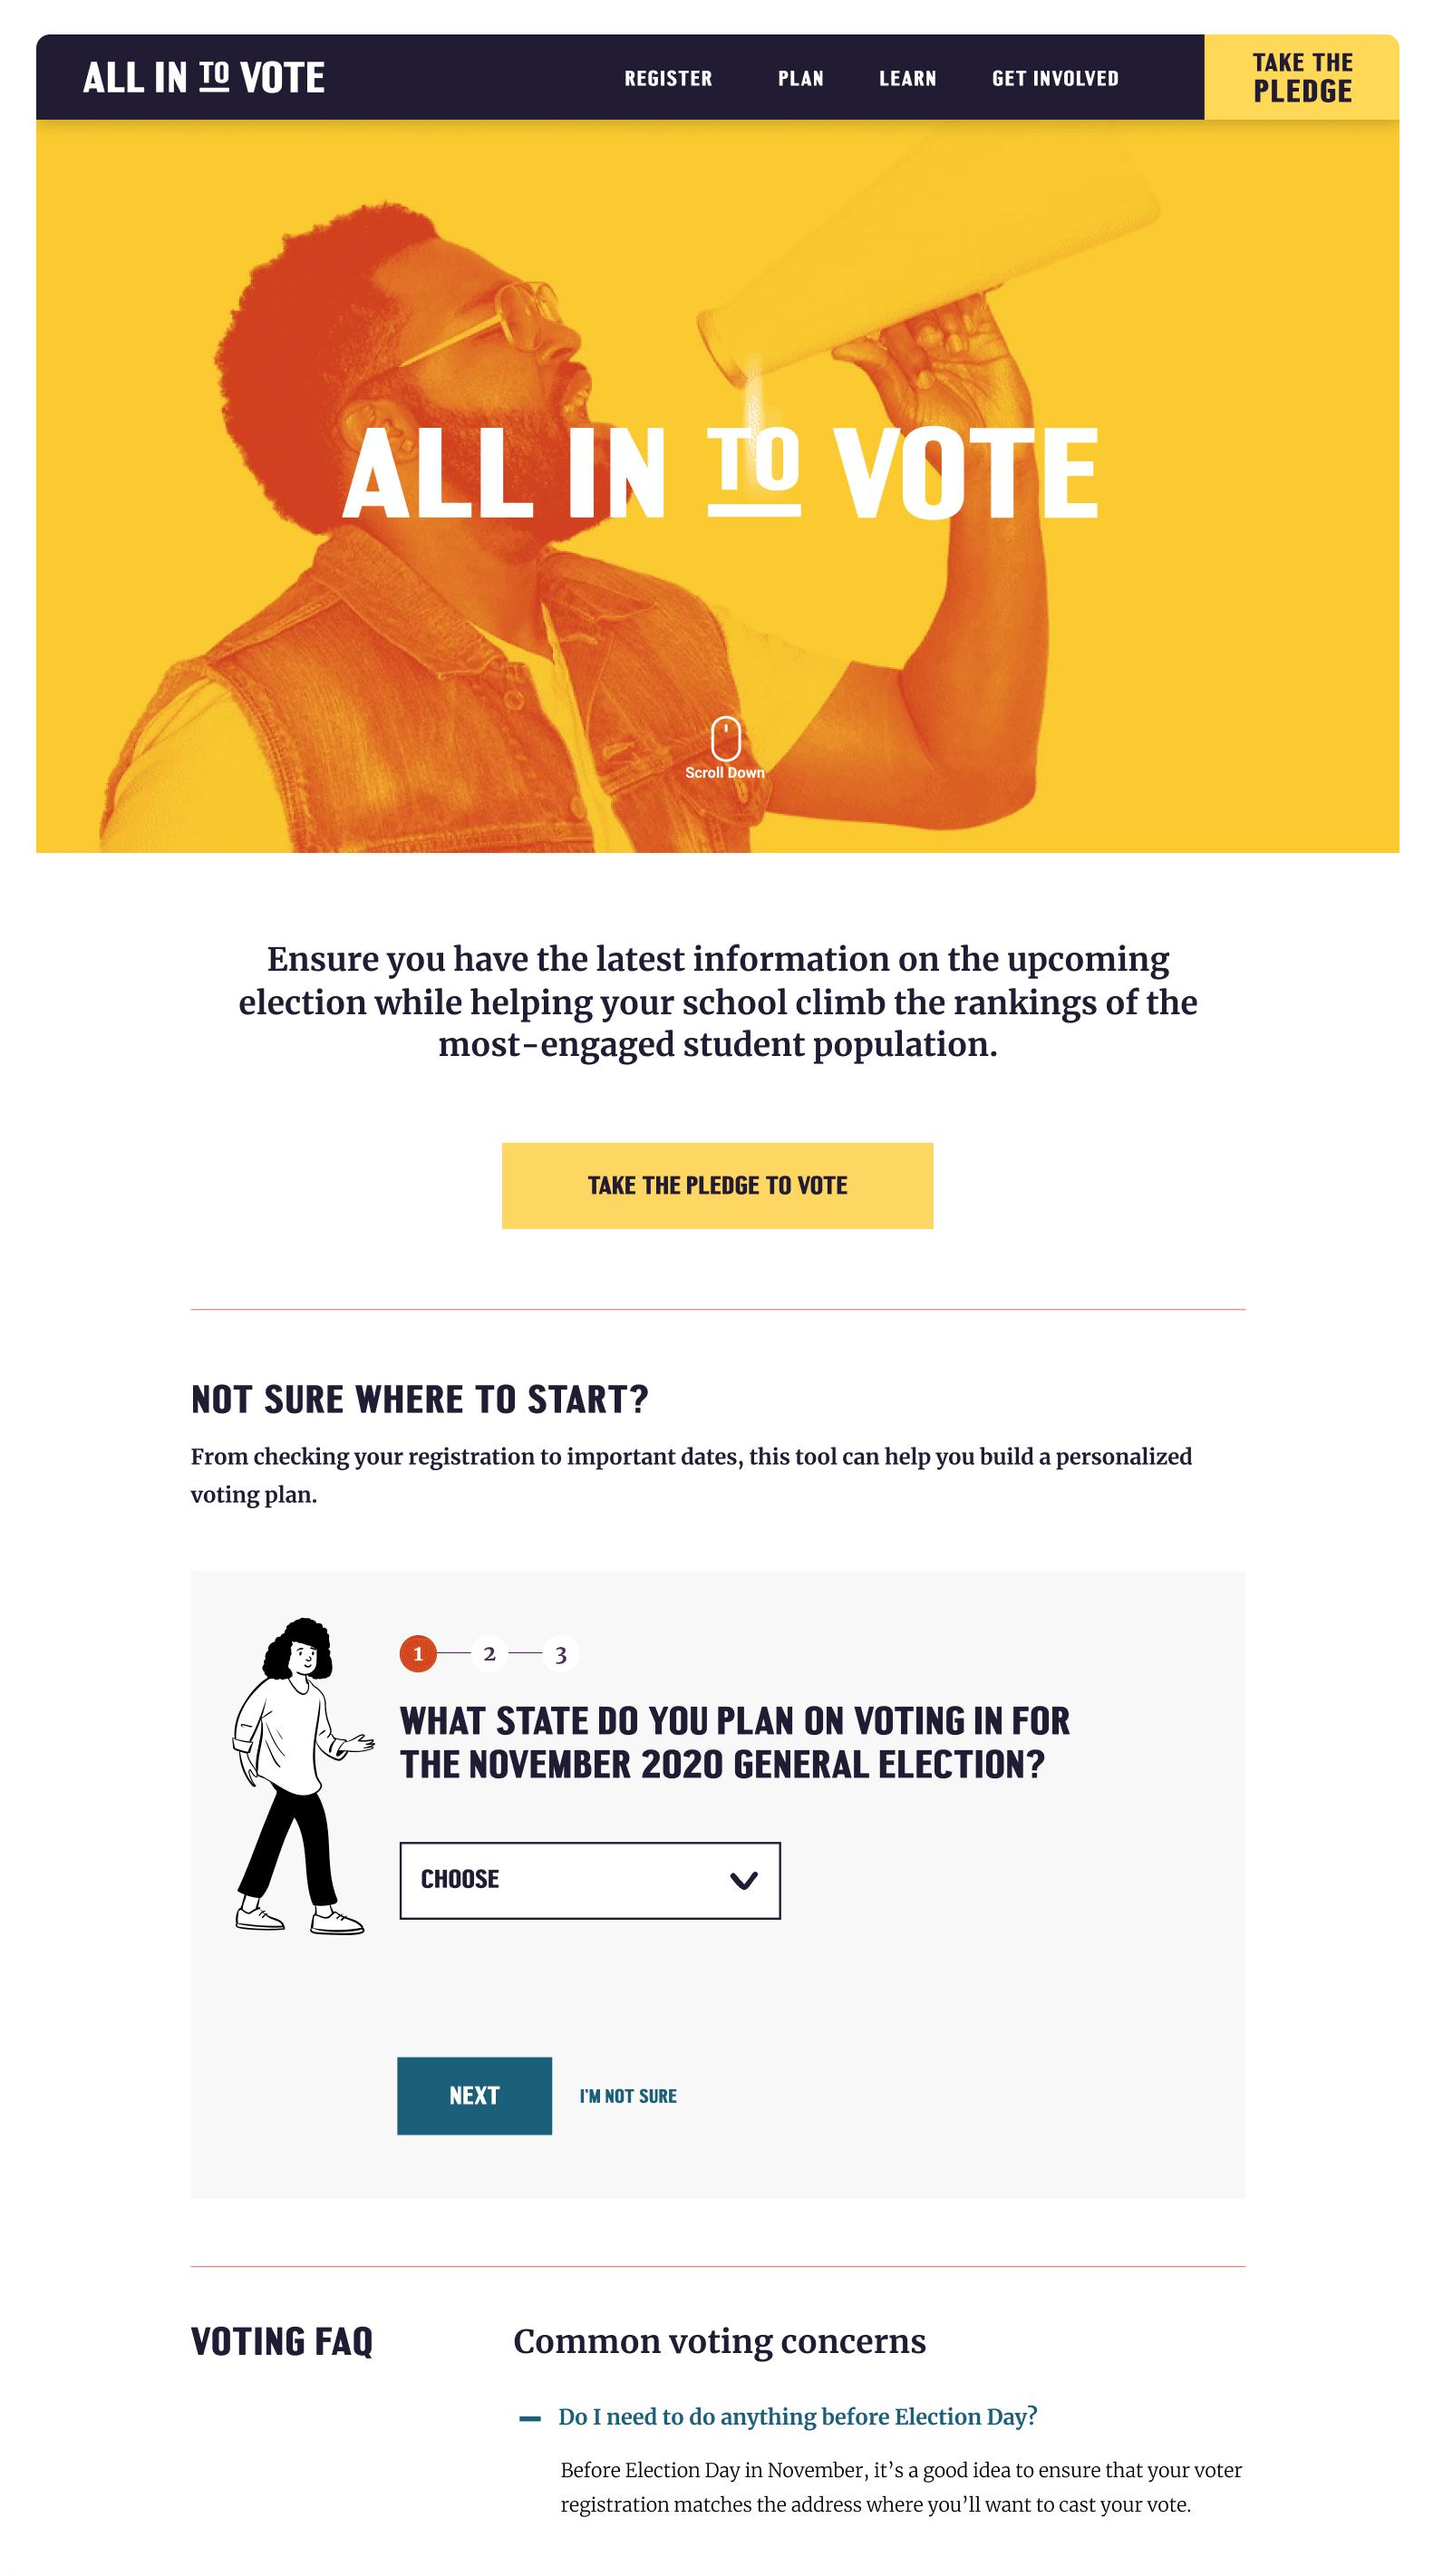 All in to vote website screenshots